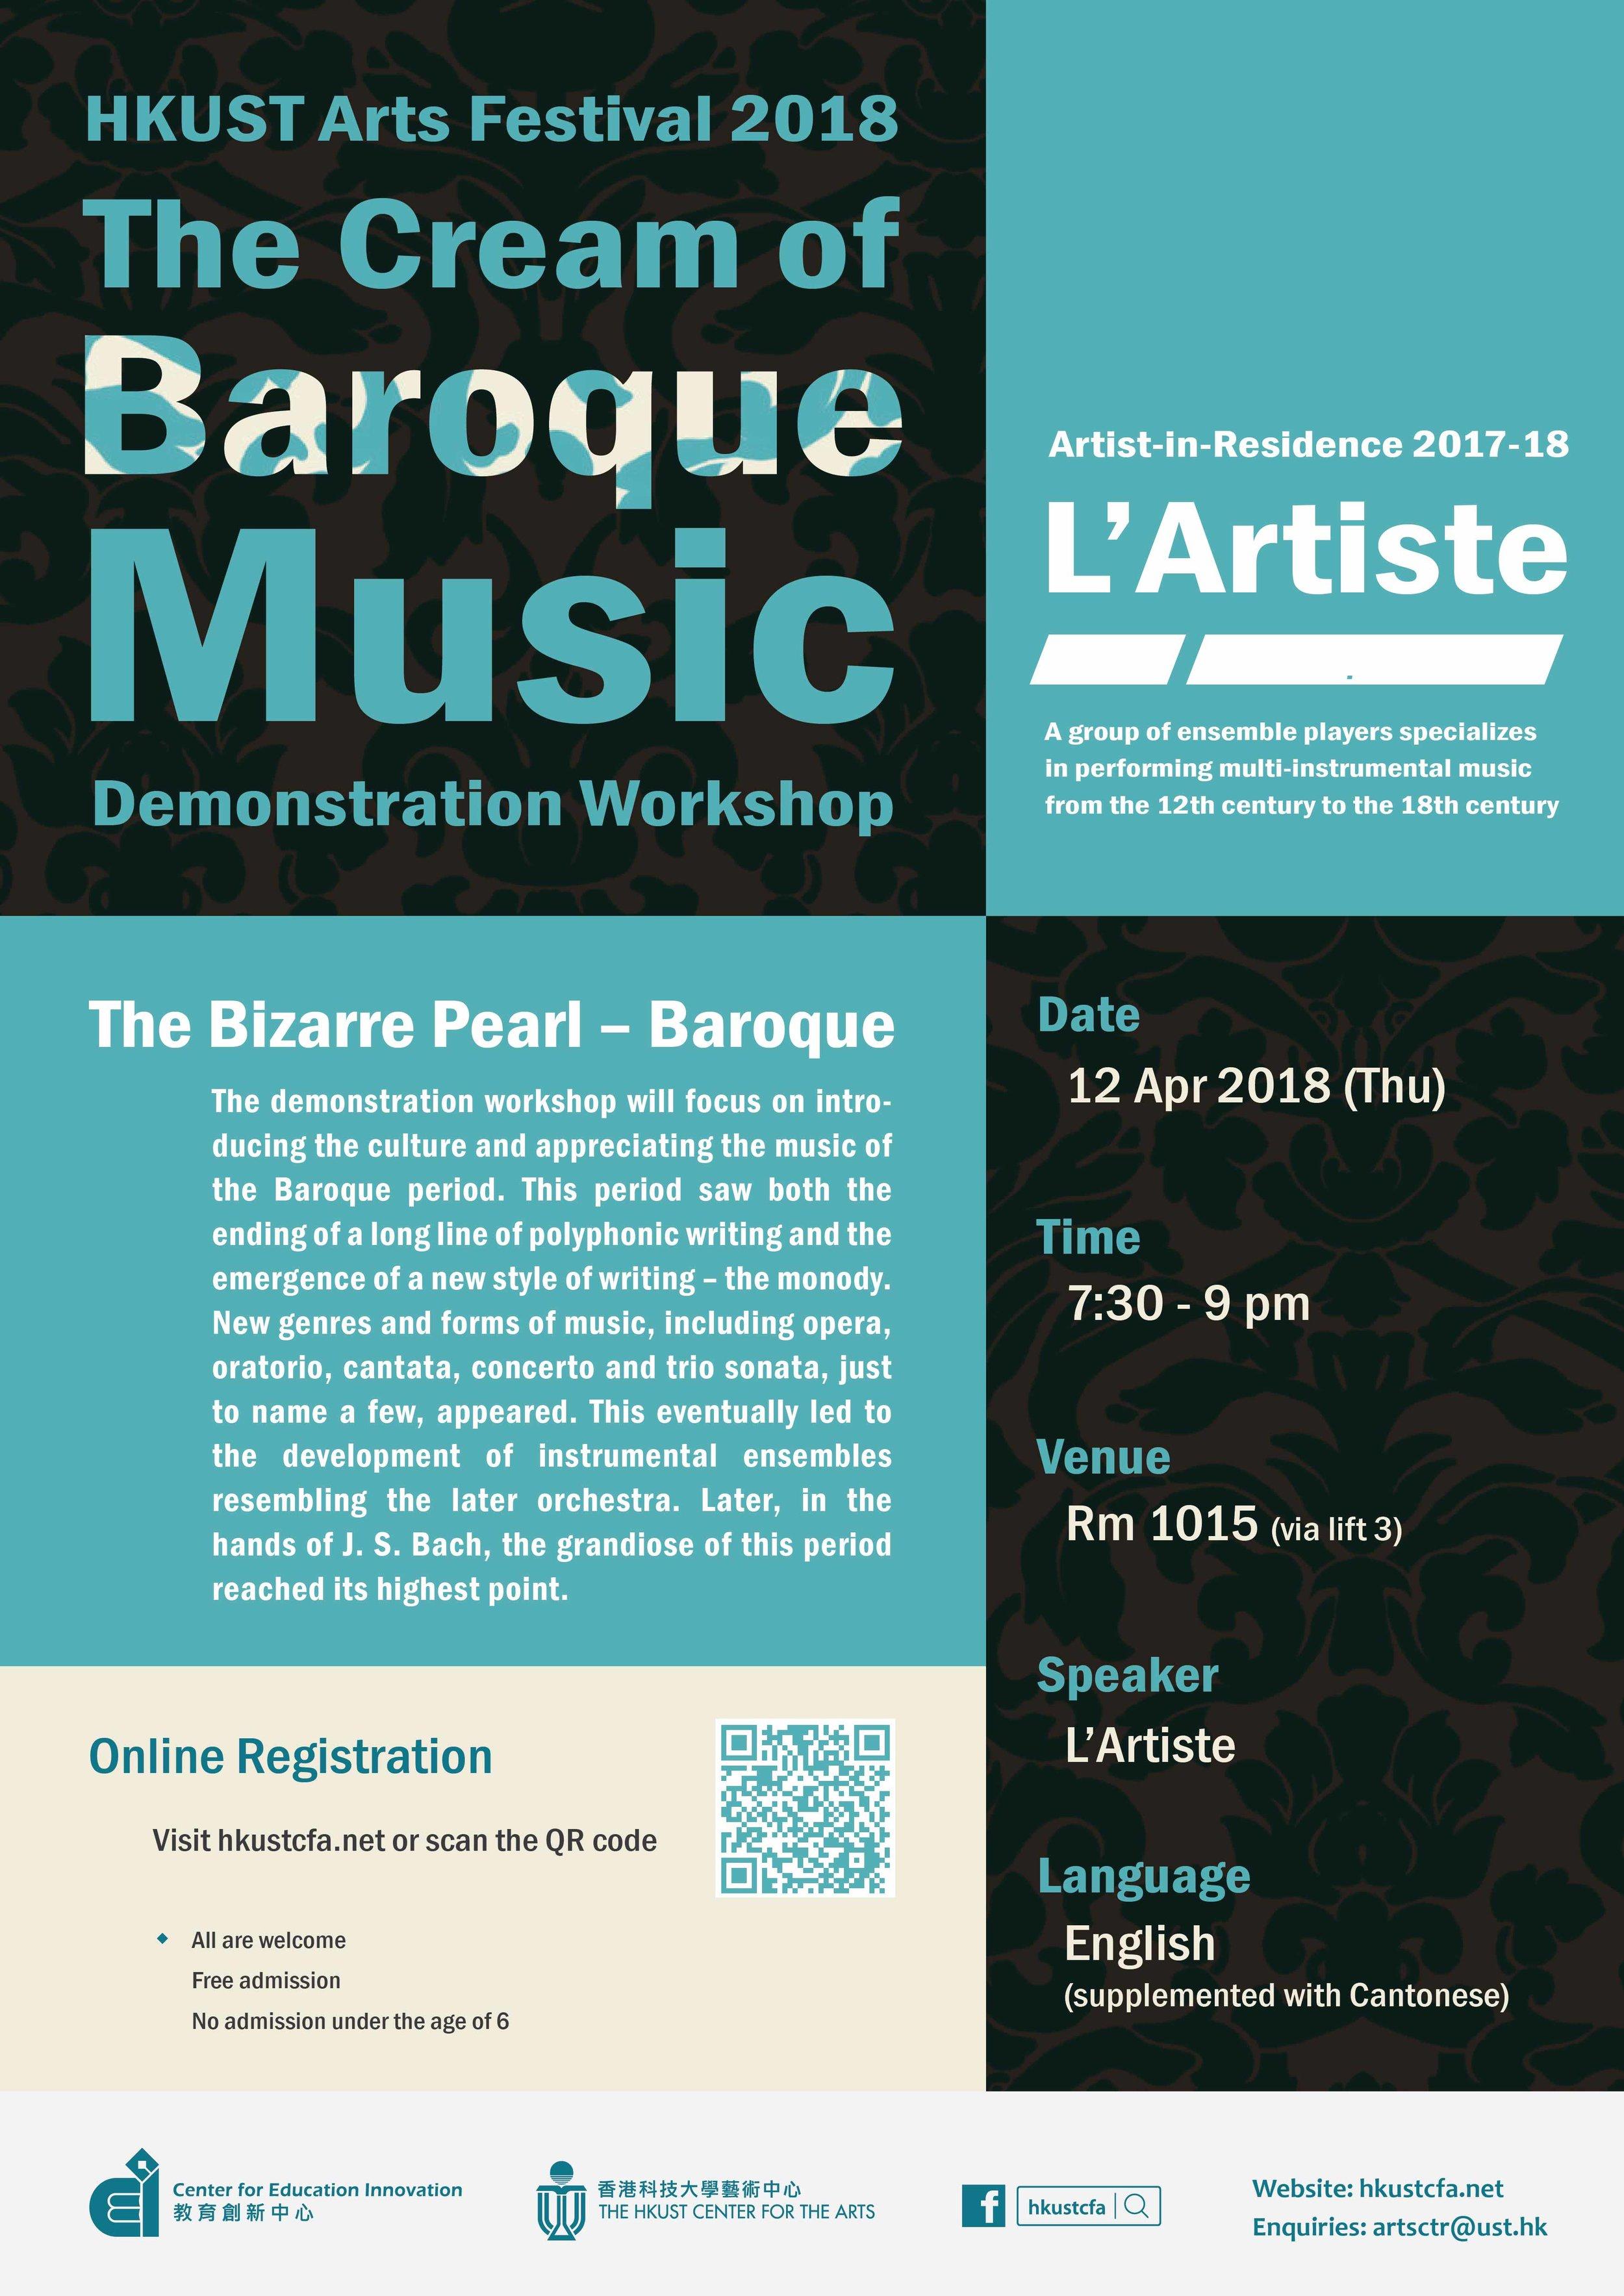 Artist-in-Residence: The Cream of Baroque Music Demonstration Workshop  Apr 12, 2018